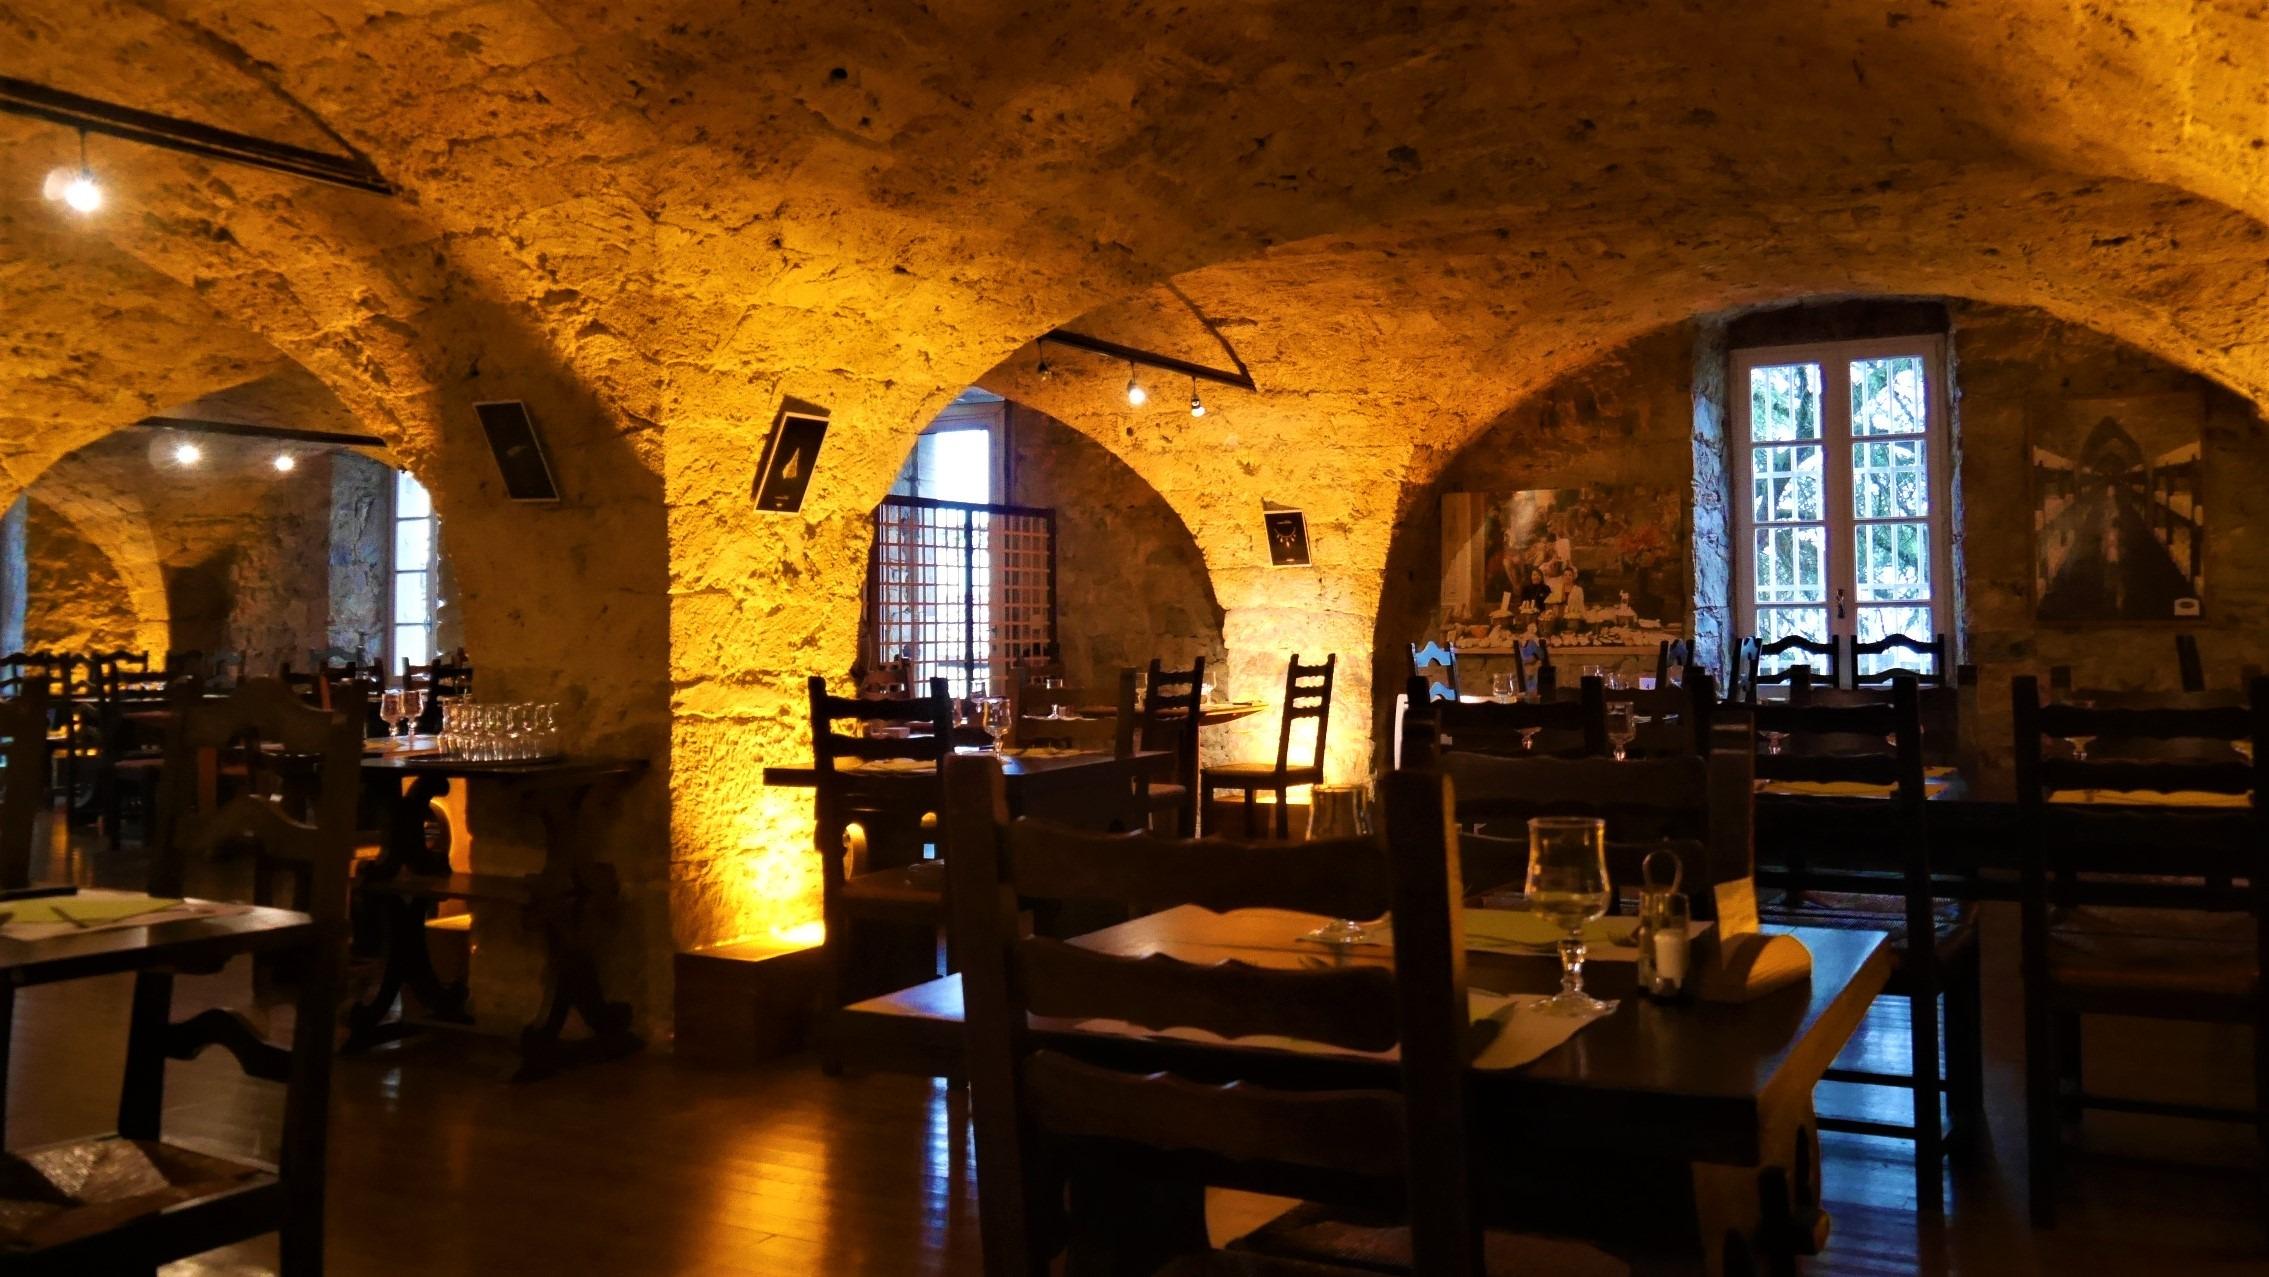 Aveyron caves Roquefort société restaurant blog voyage france